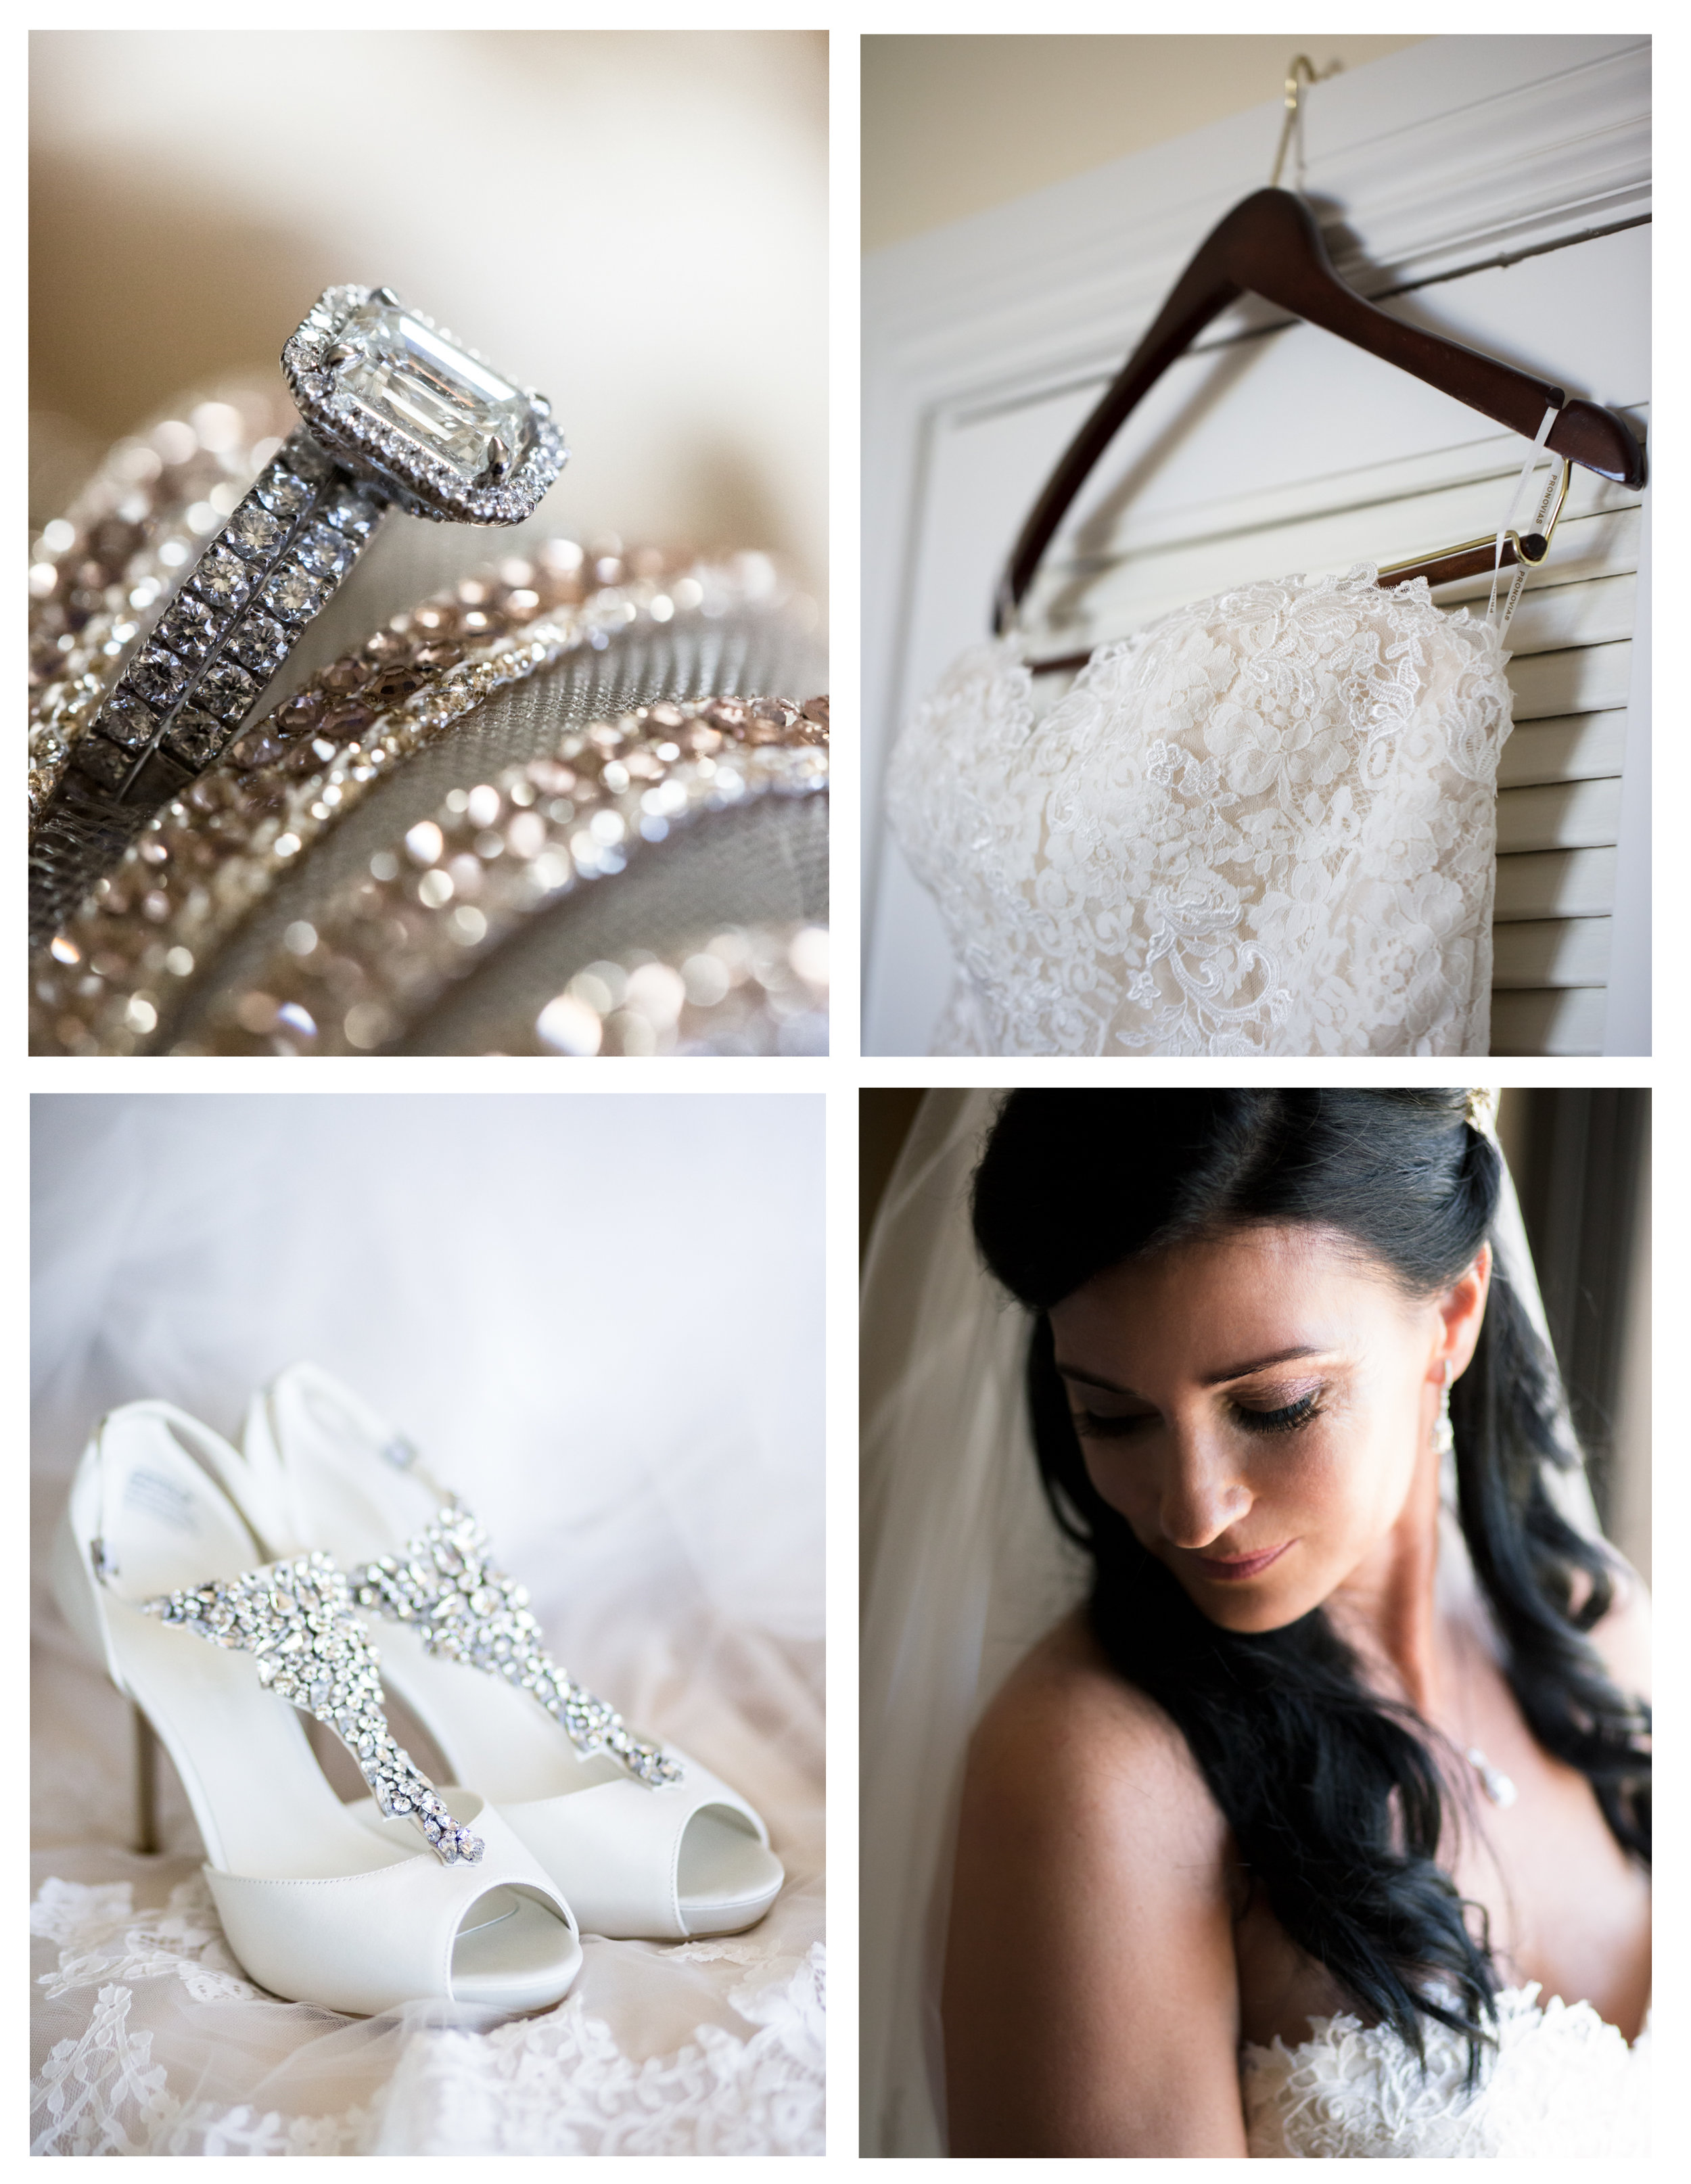 Benvenuto_Boynton_Beach_Wedding_Christine_and Doug_Married 18.jpg